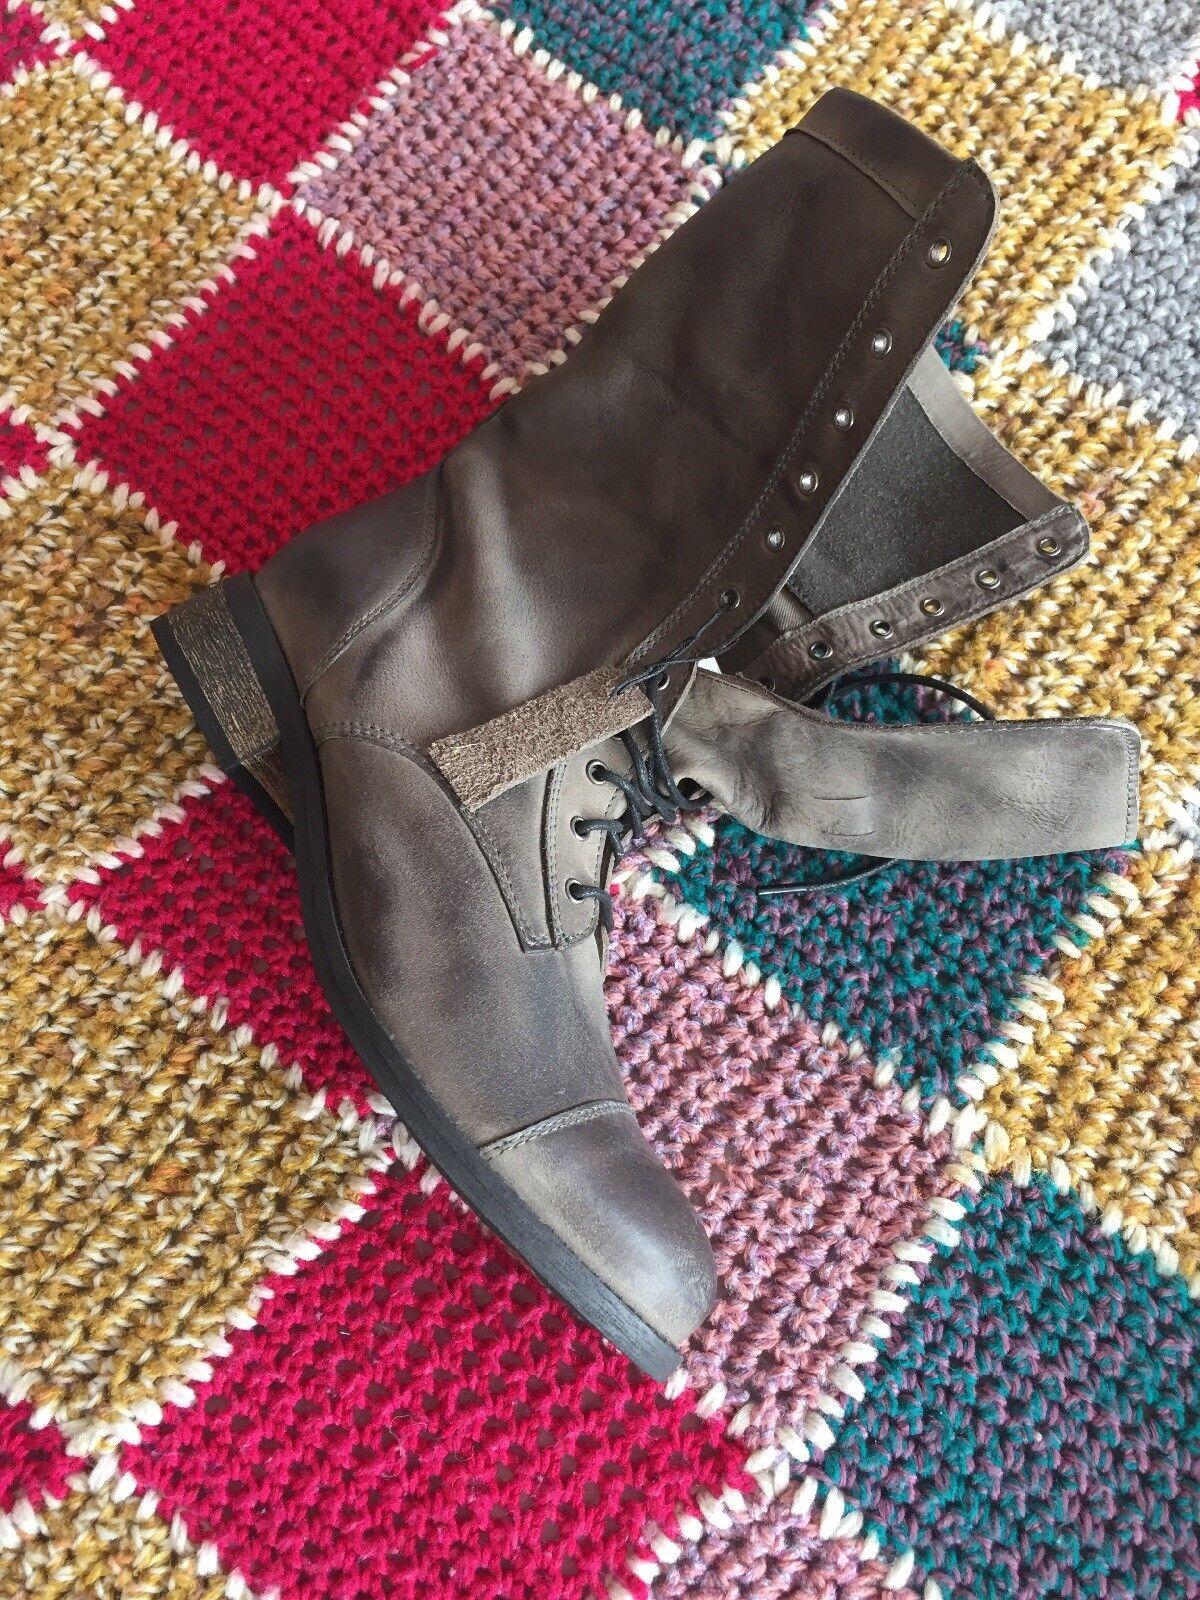 6. BNWT Grau Flat Ankle Casual Stiefel. Stiefel. Casual Real Leder. a216a0